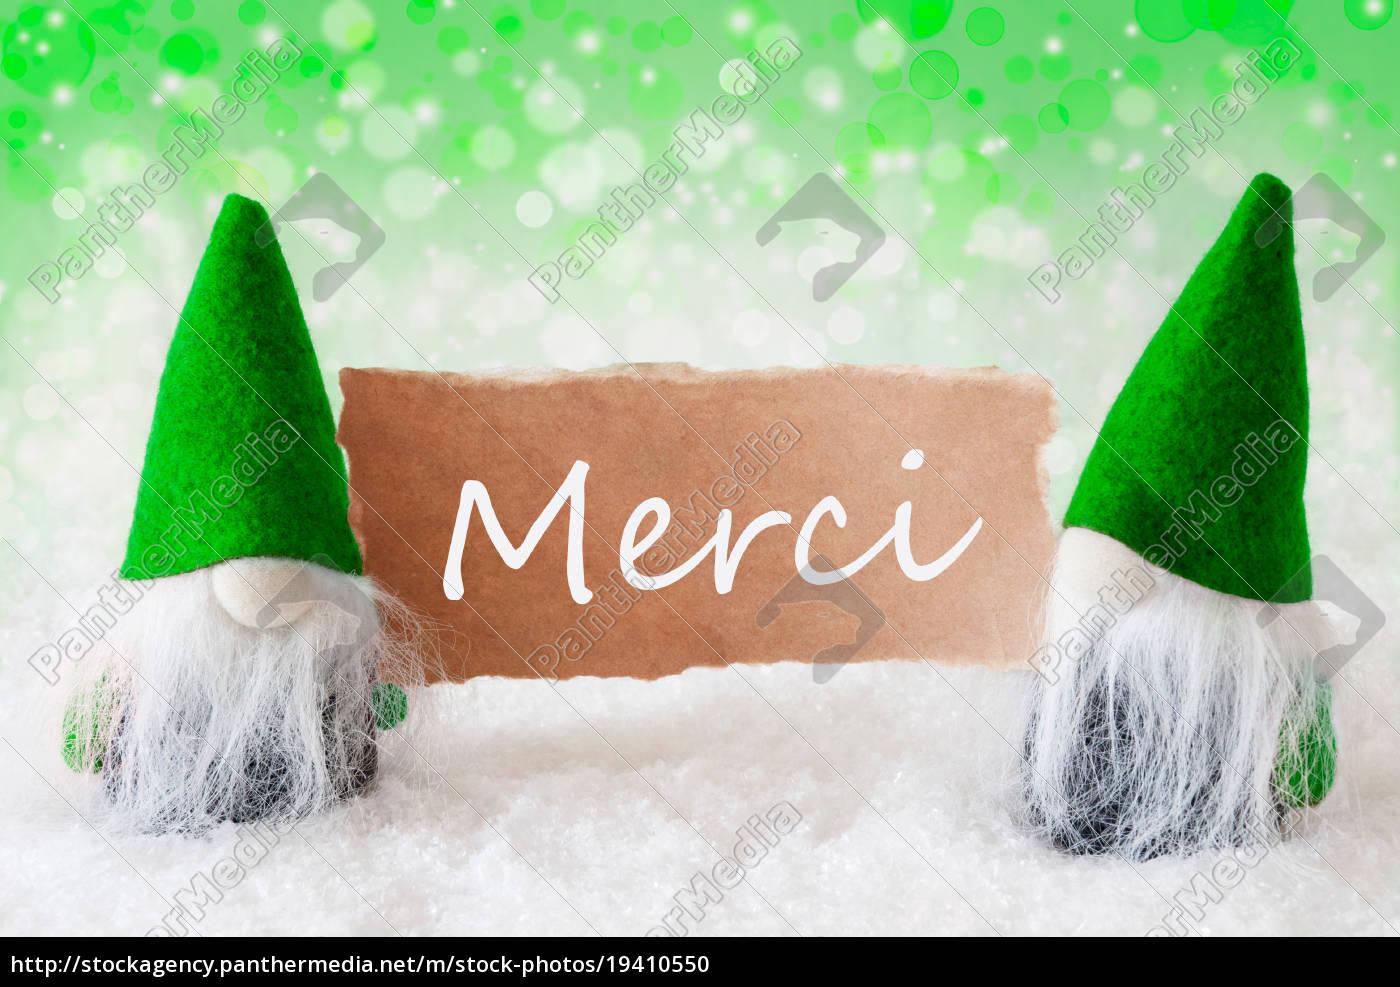 green, natural, gnomes, with, card, , merci - 19410550